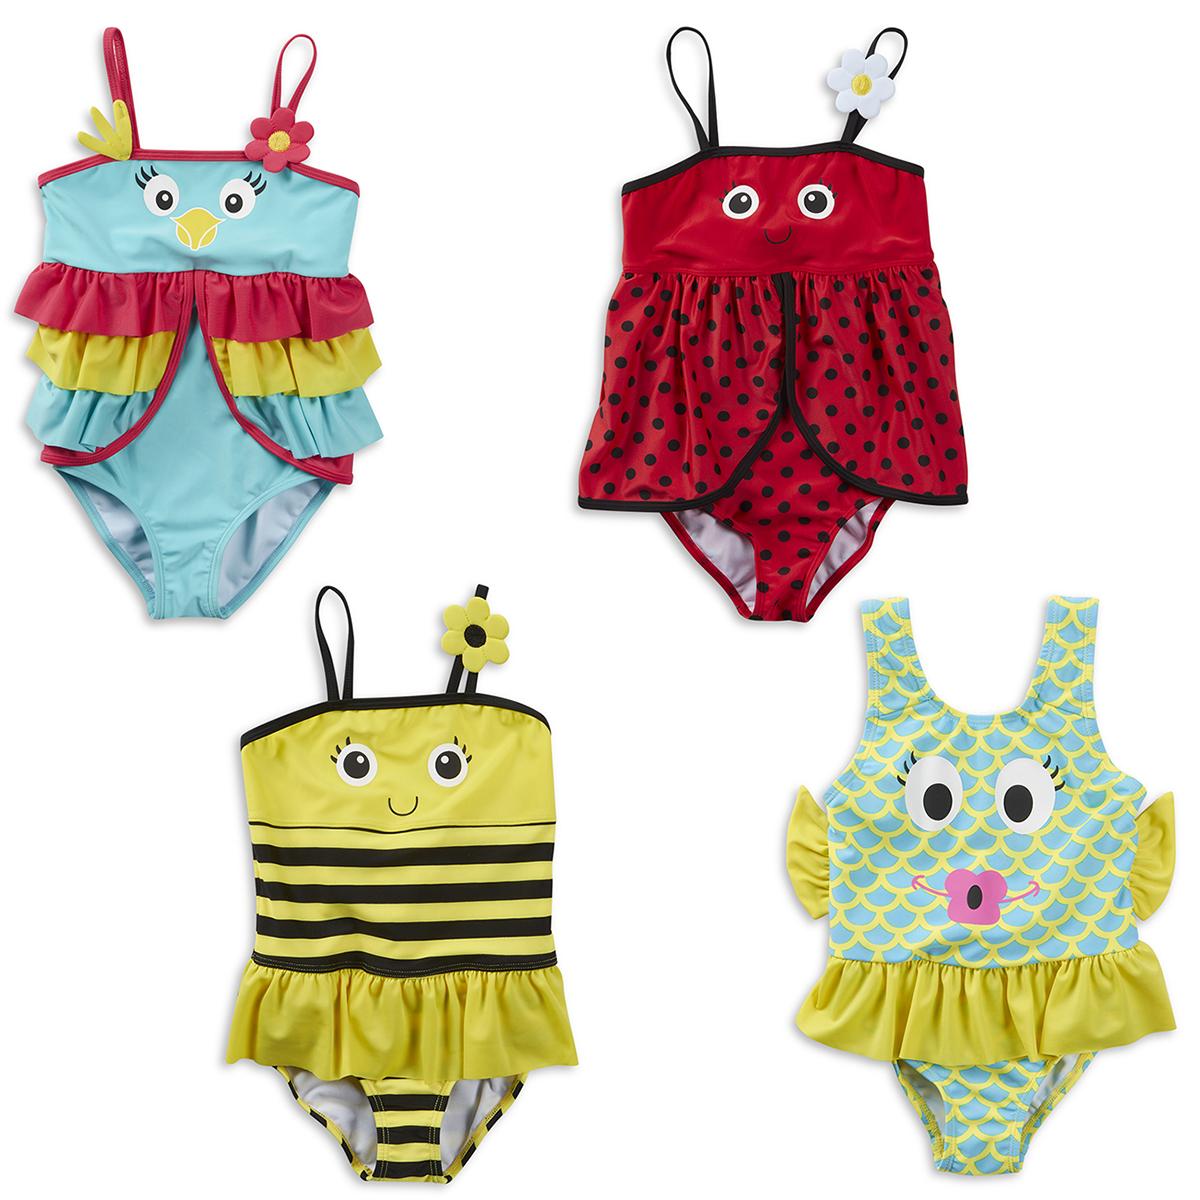 68659a628d Infant Girls Novelty Swimwear Swimming Suit Swim Costume 2-6 Years New  MINIKIDZ